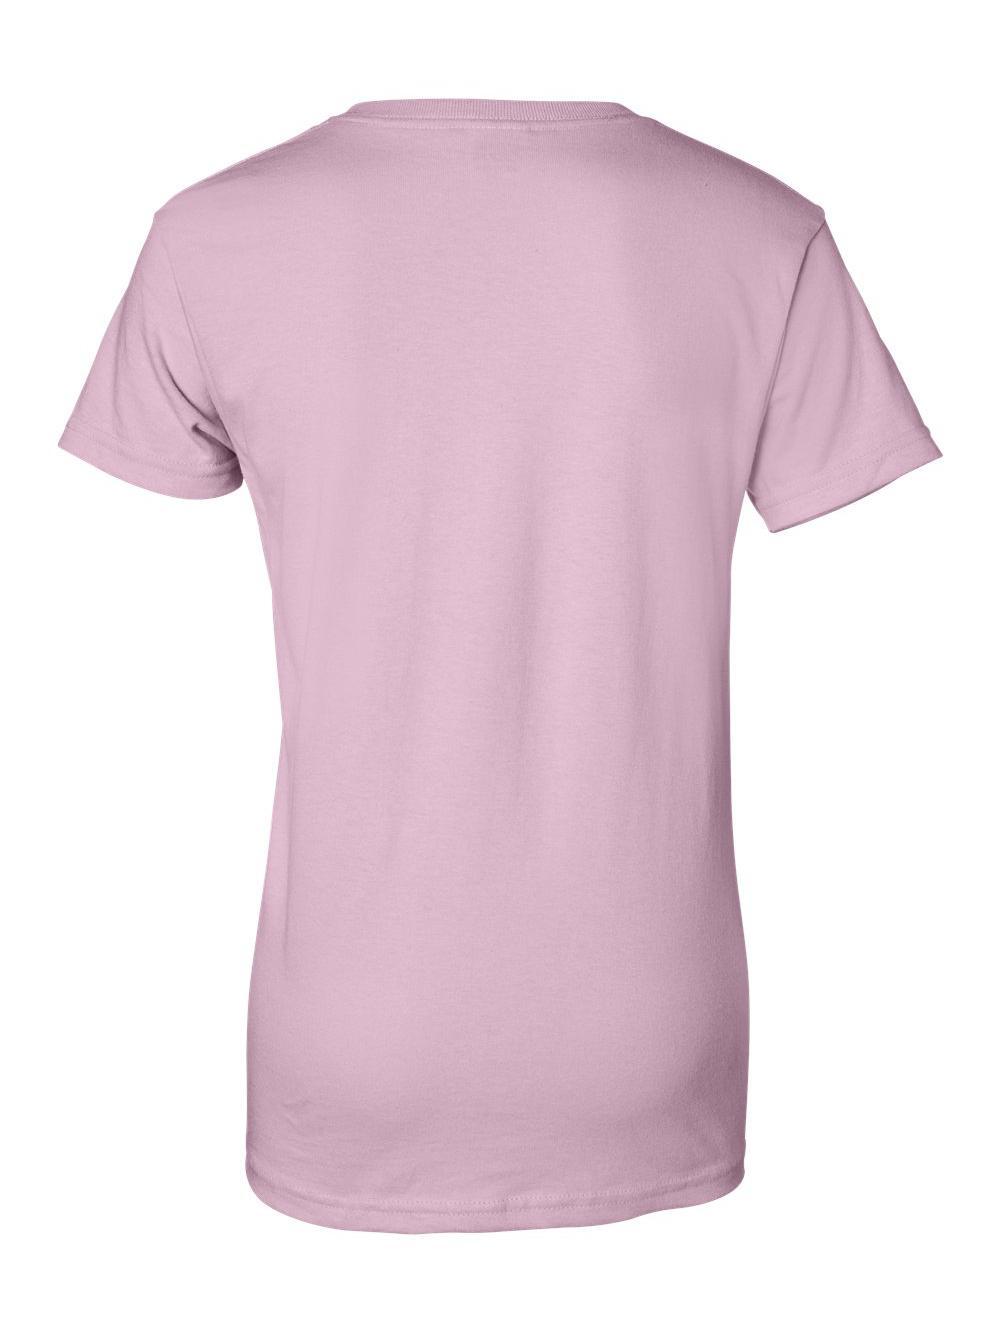 Gildan-Ultra-Cotton-Women-039-s-T-Shirt-2000L thumbnail 37